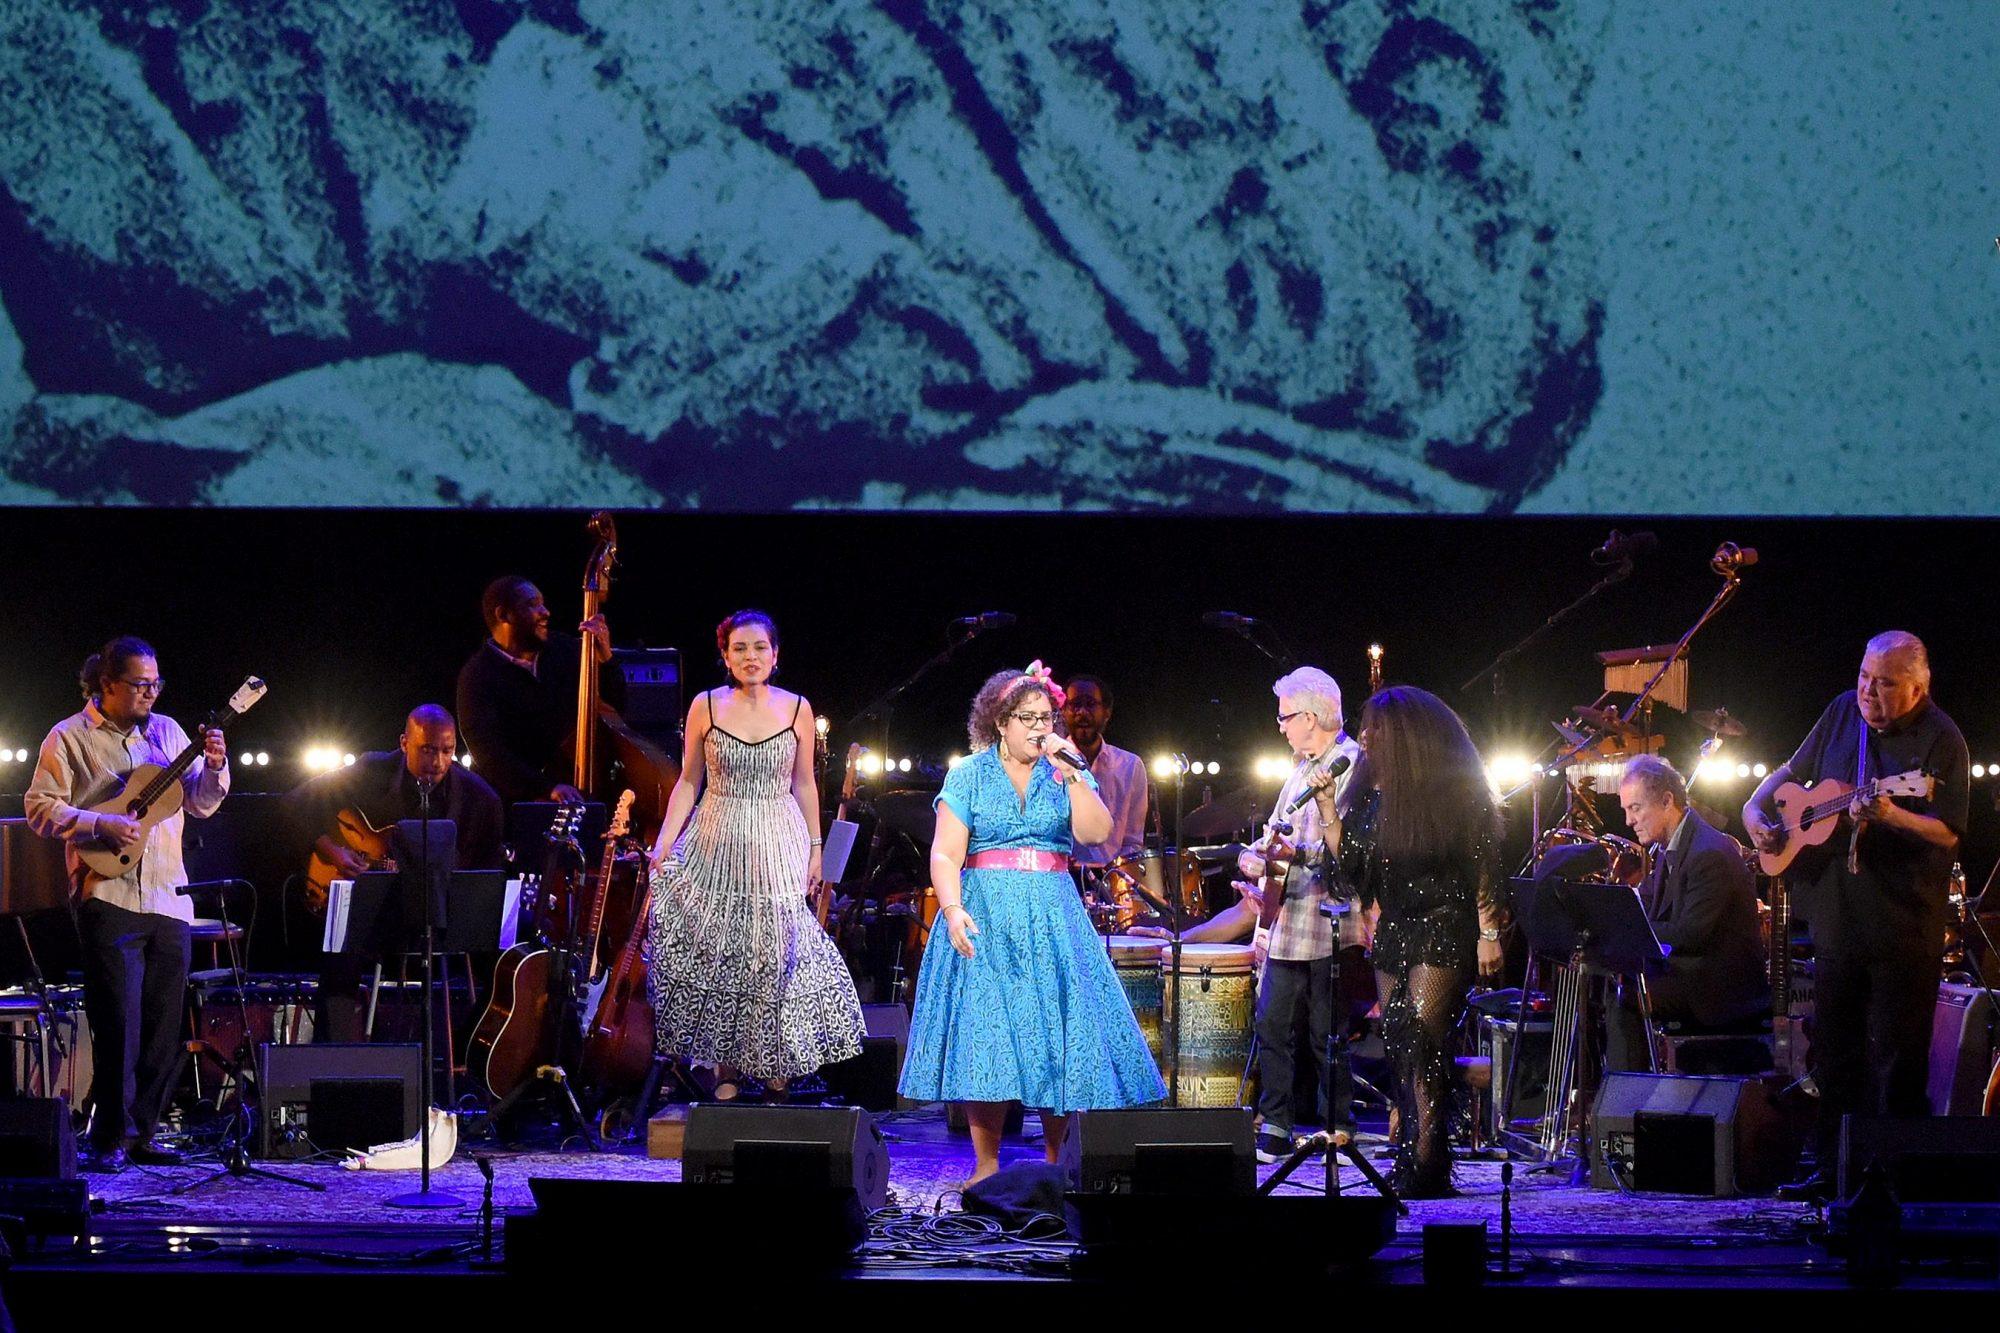 Vivien Killilea/Getty Images for The Music Center